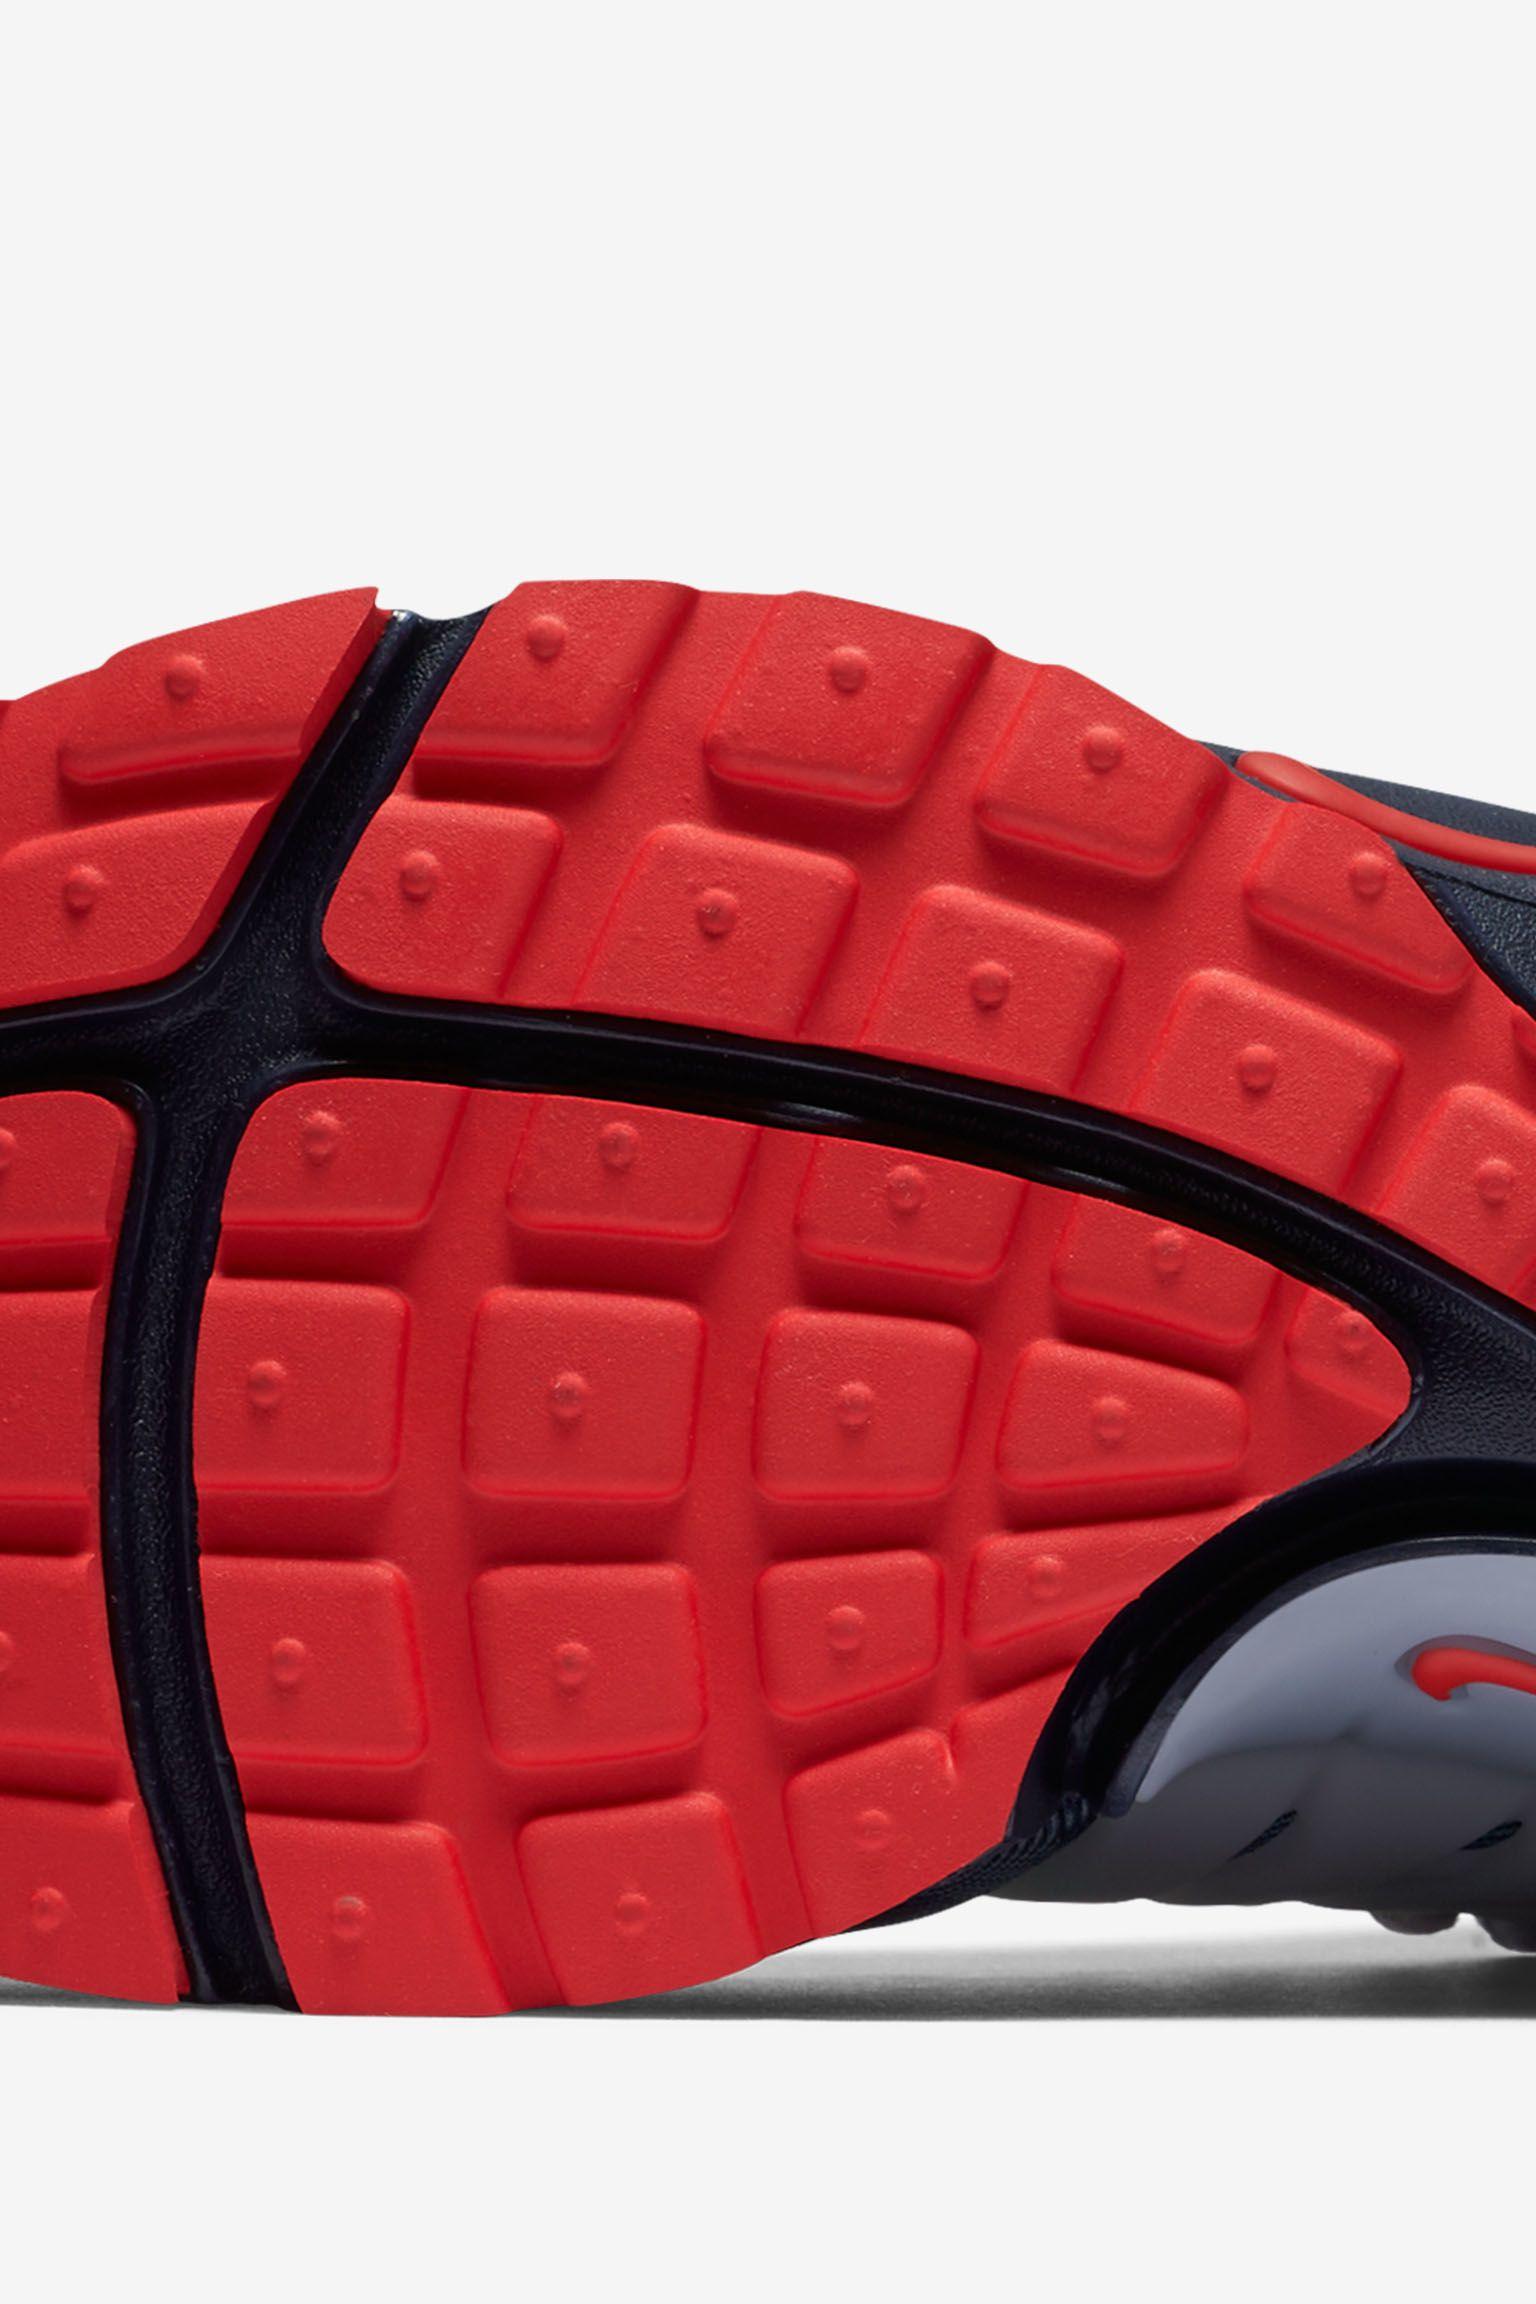 Nike Air Presto 'USA' Release Date